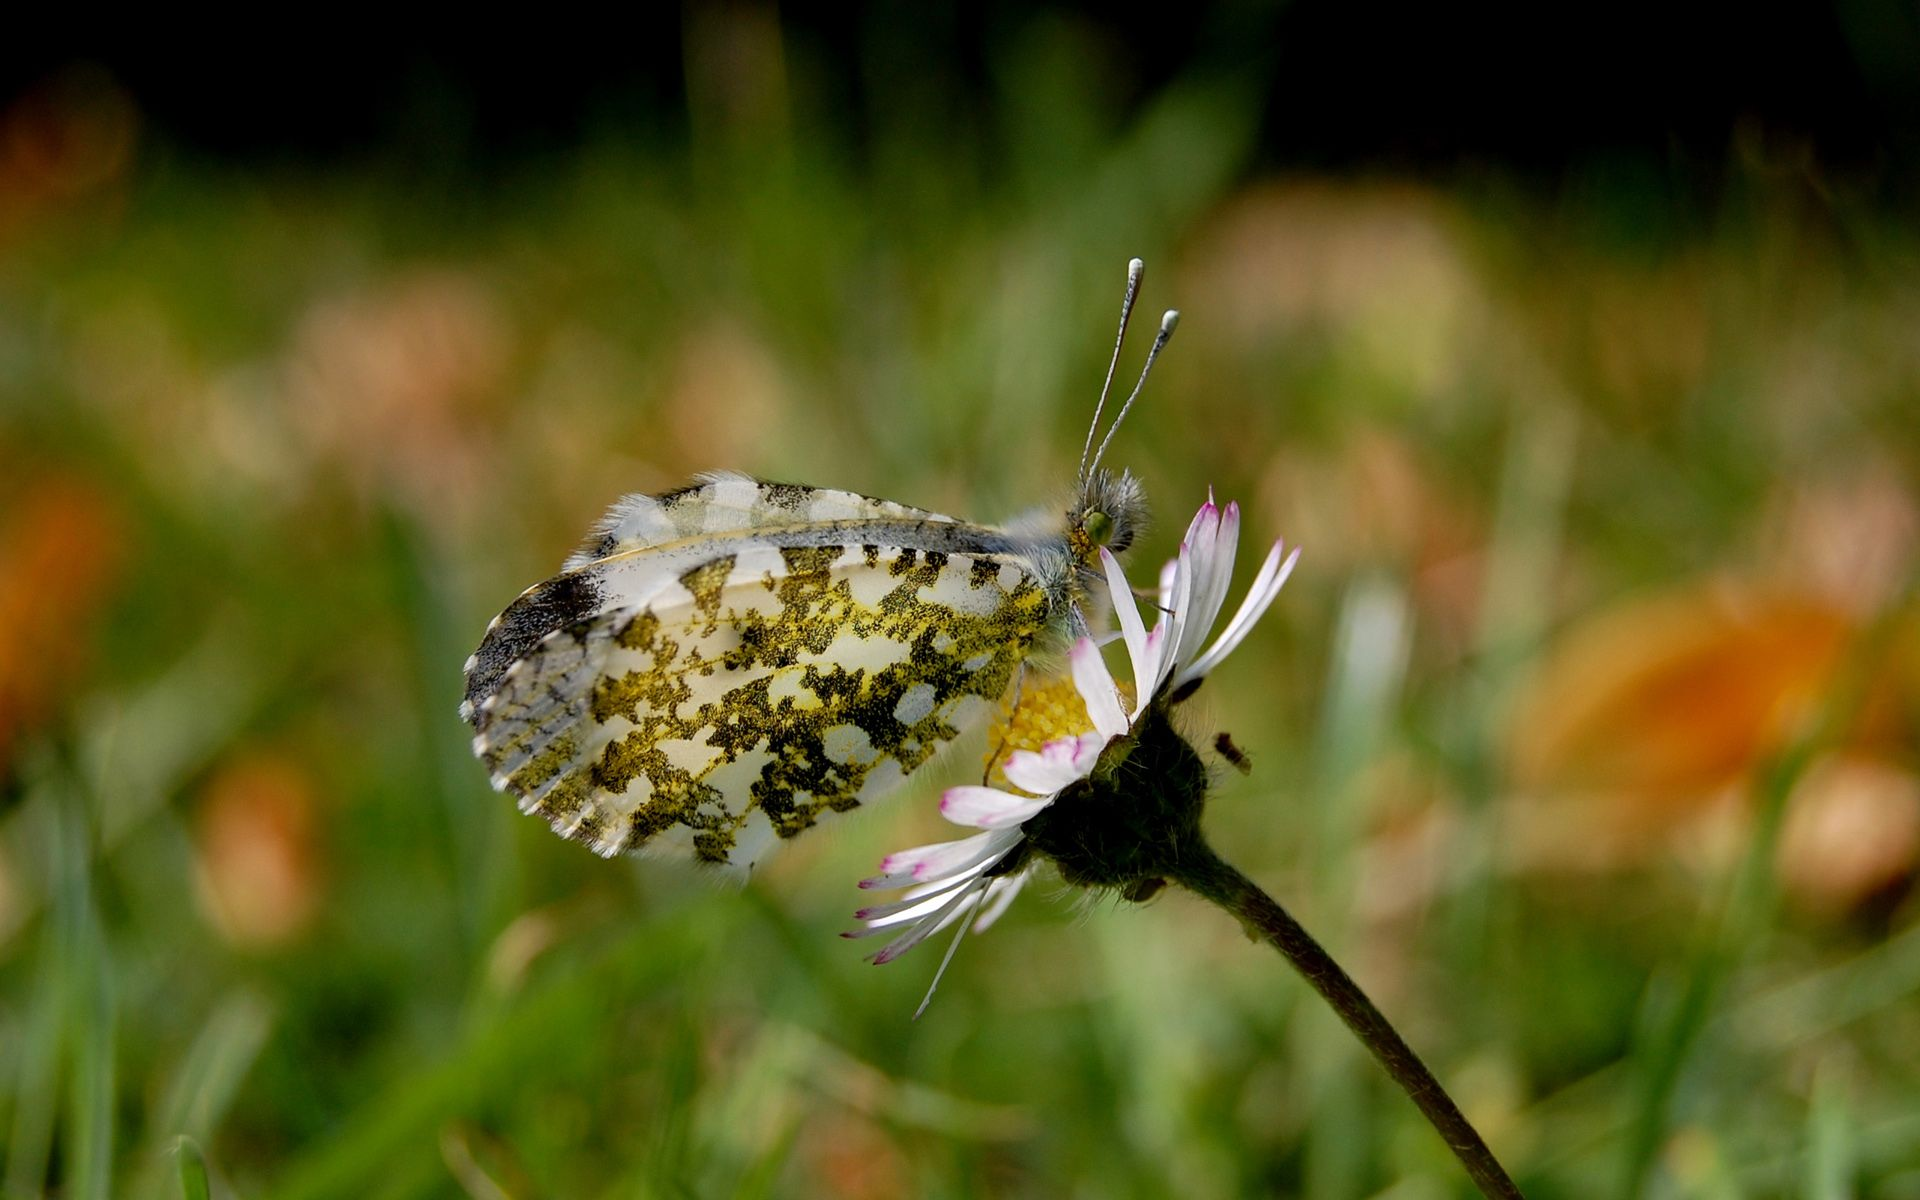 Con bướm mùa hè 1920x1200 của Banksie